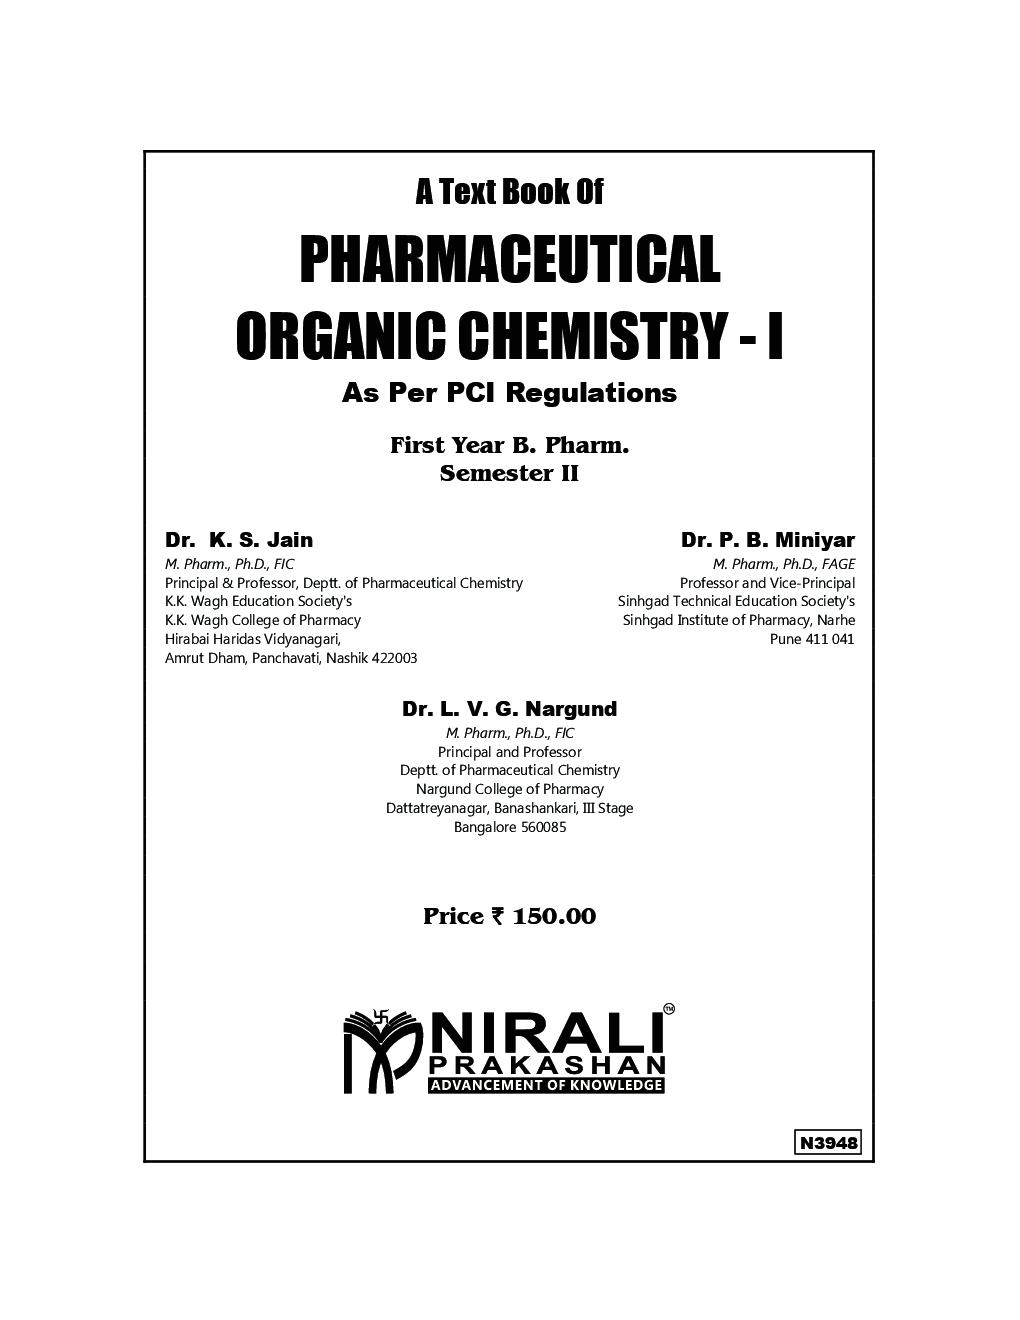 Download Nirali Pharmaceutical Organic Chemistry-1 PDF